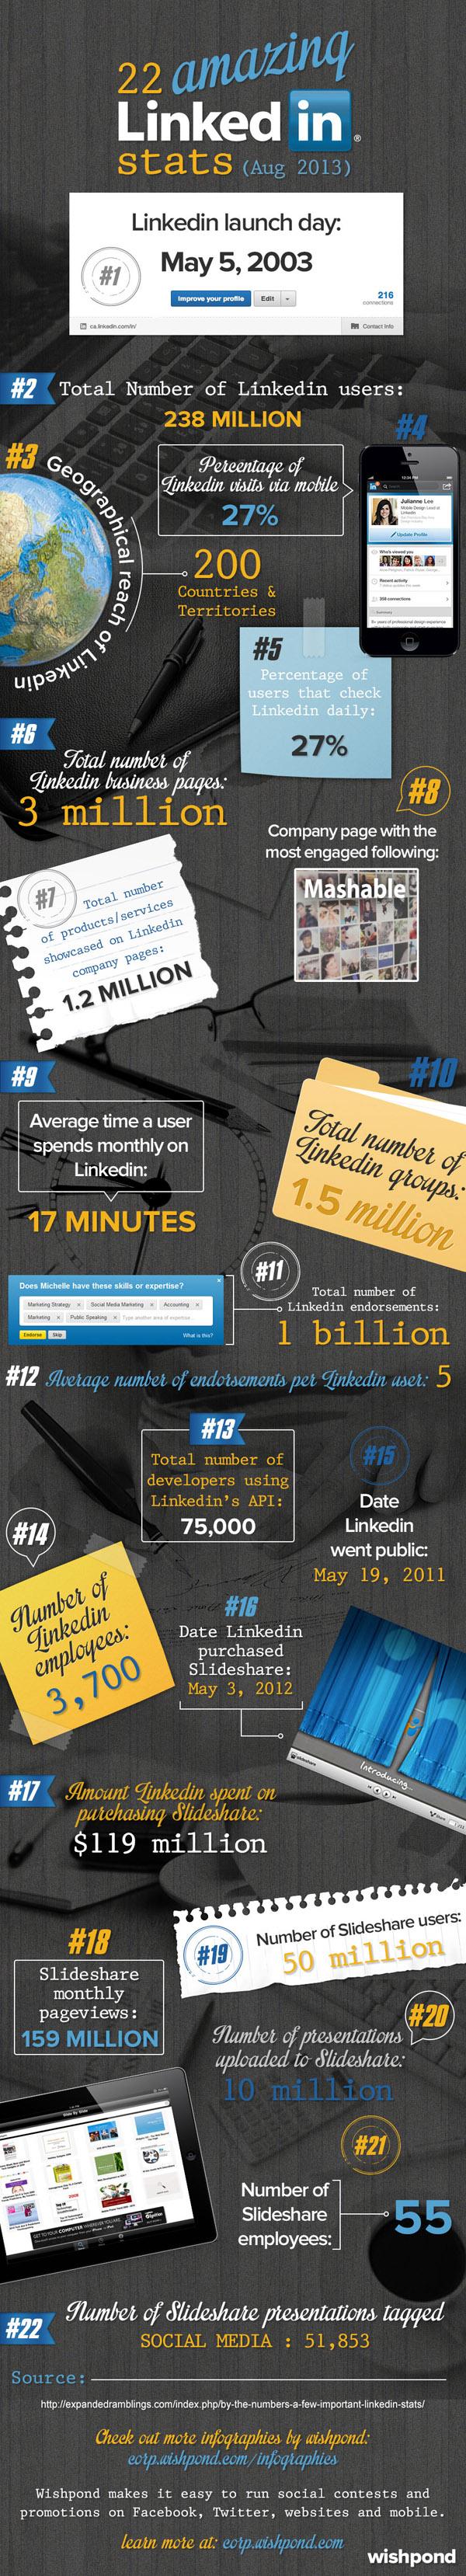 2013 LinkedIn Statistics [infographic]